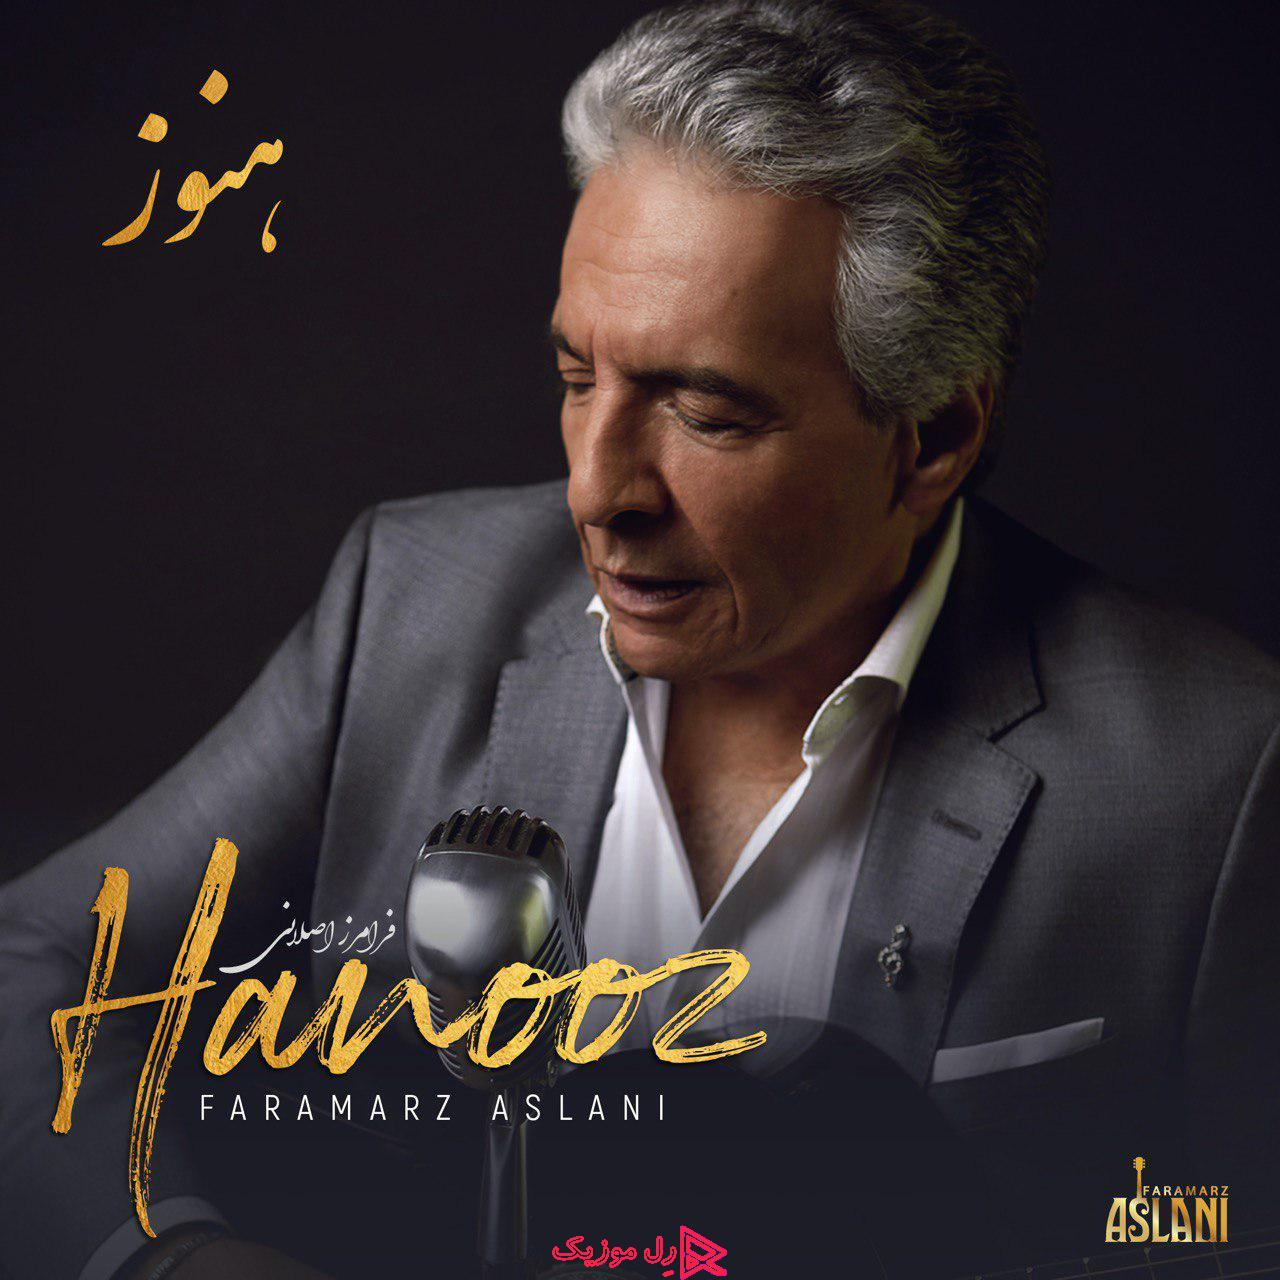 Faramarz Aslani Hanooz Romantic Version RellMusic - دانلود آهنگ فرامرز اصلانی به نام هنوز {ورژن رومانتیک}